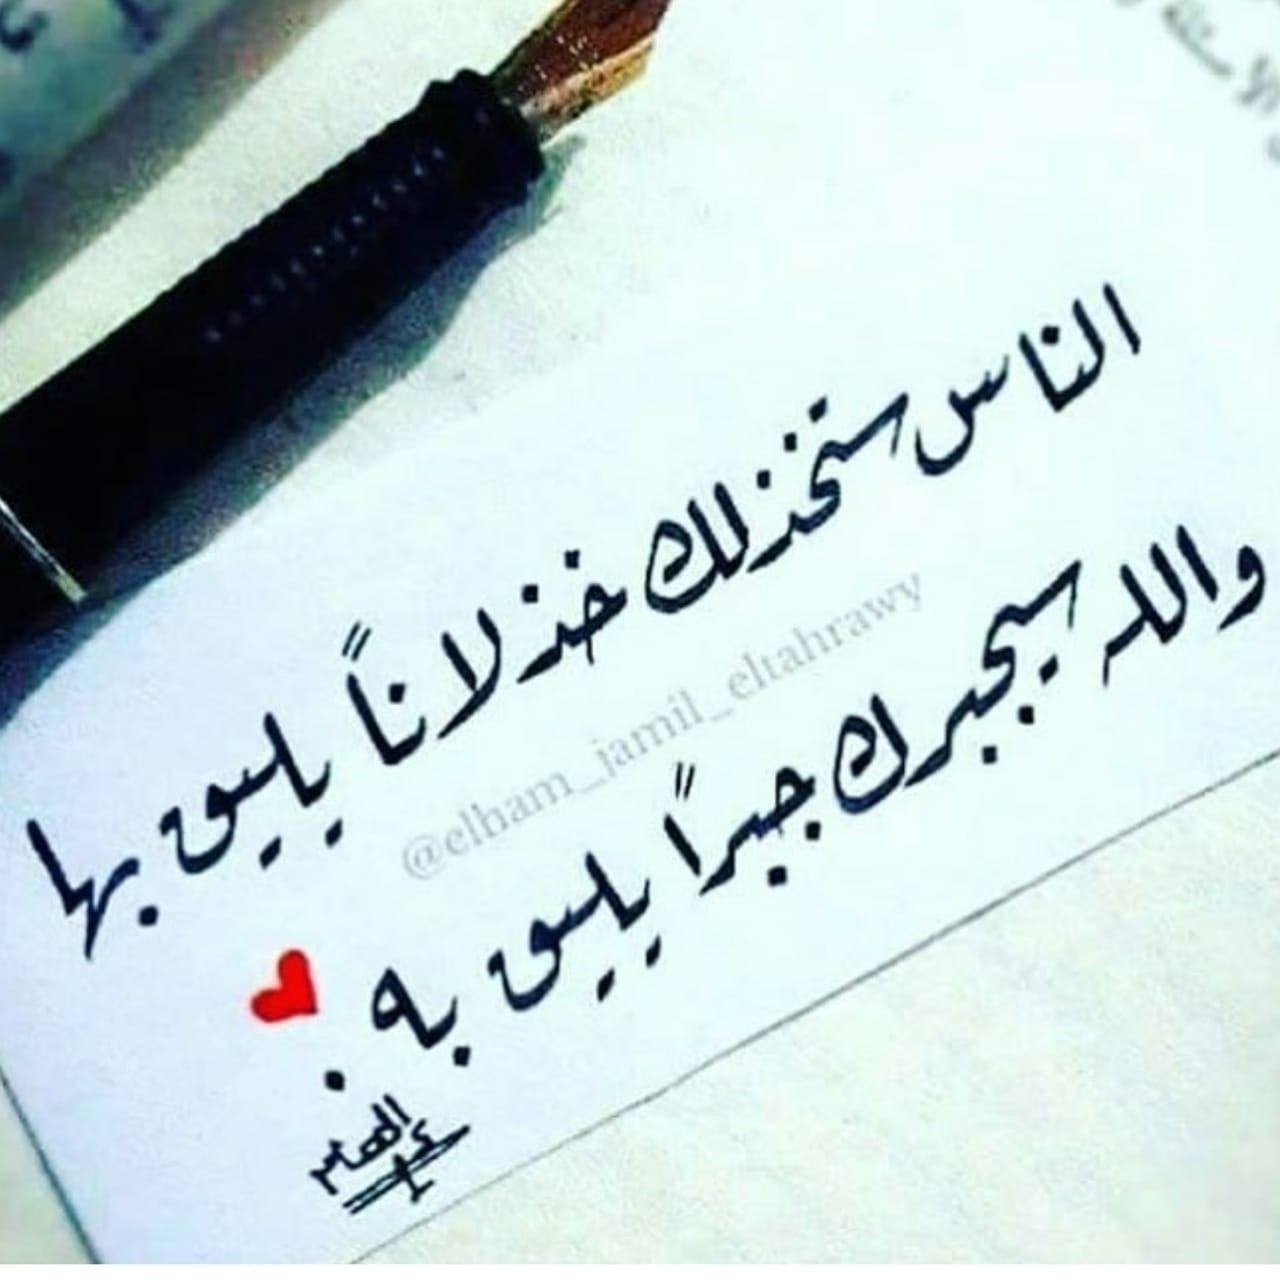 انادي يا الله A N S الله ناس عبارات جميل الكلام اقوال Arabic Quotes Arabic Calligraphy Quotes